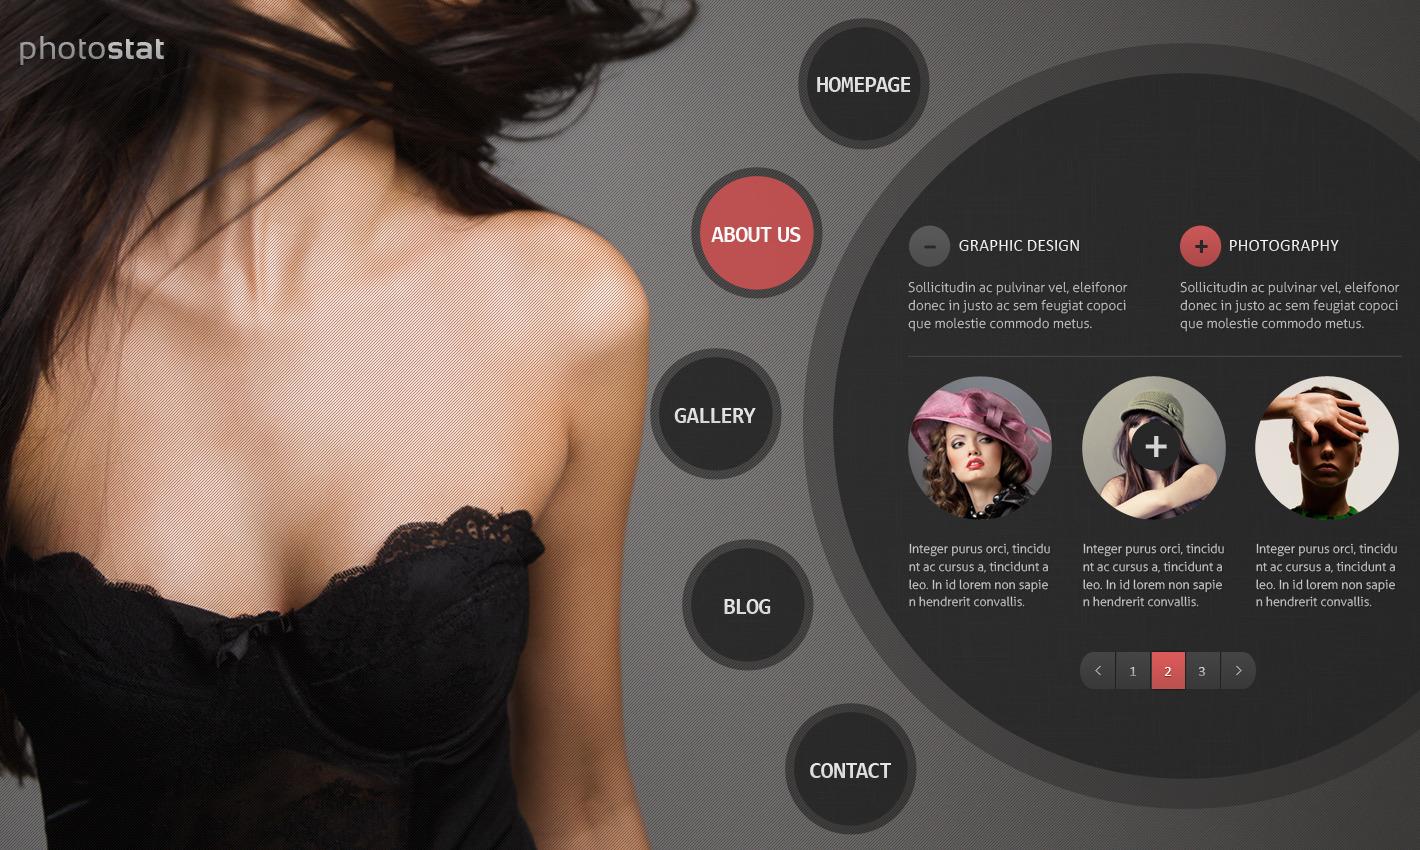 Photostat - Beauty, style, class.